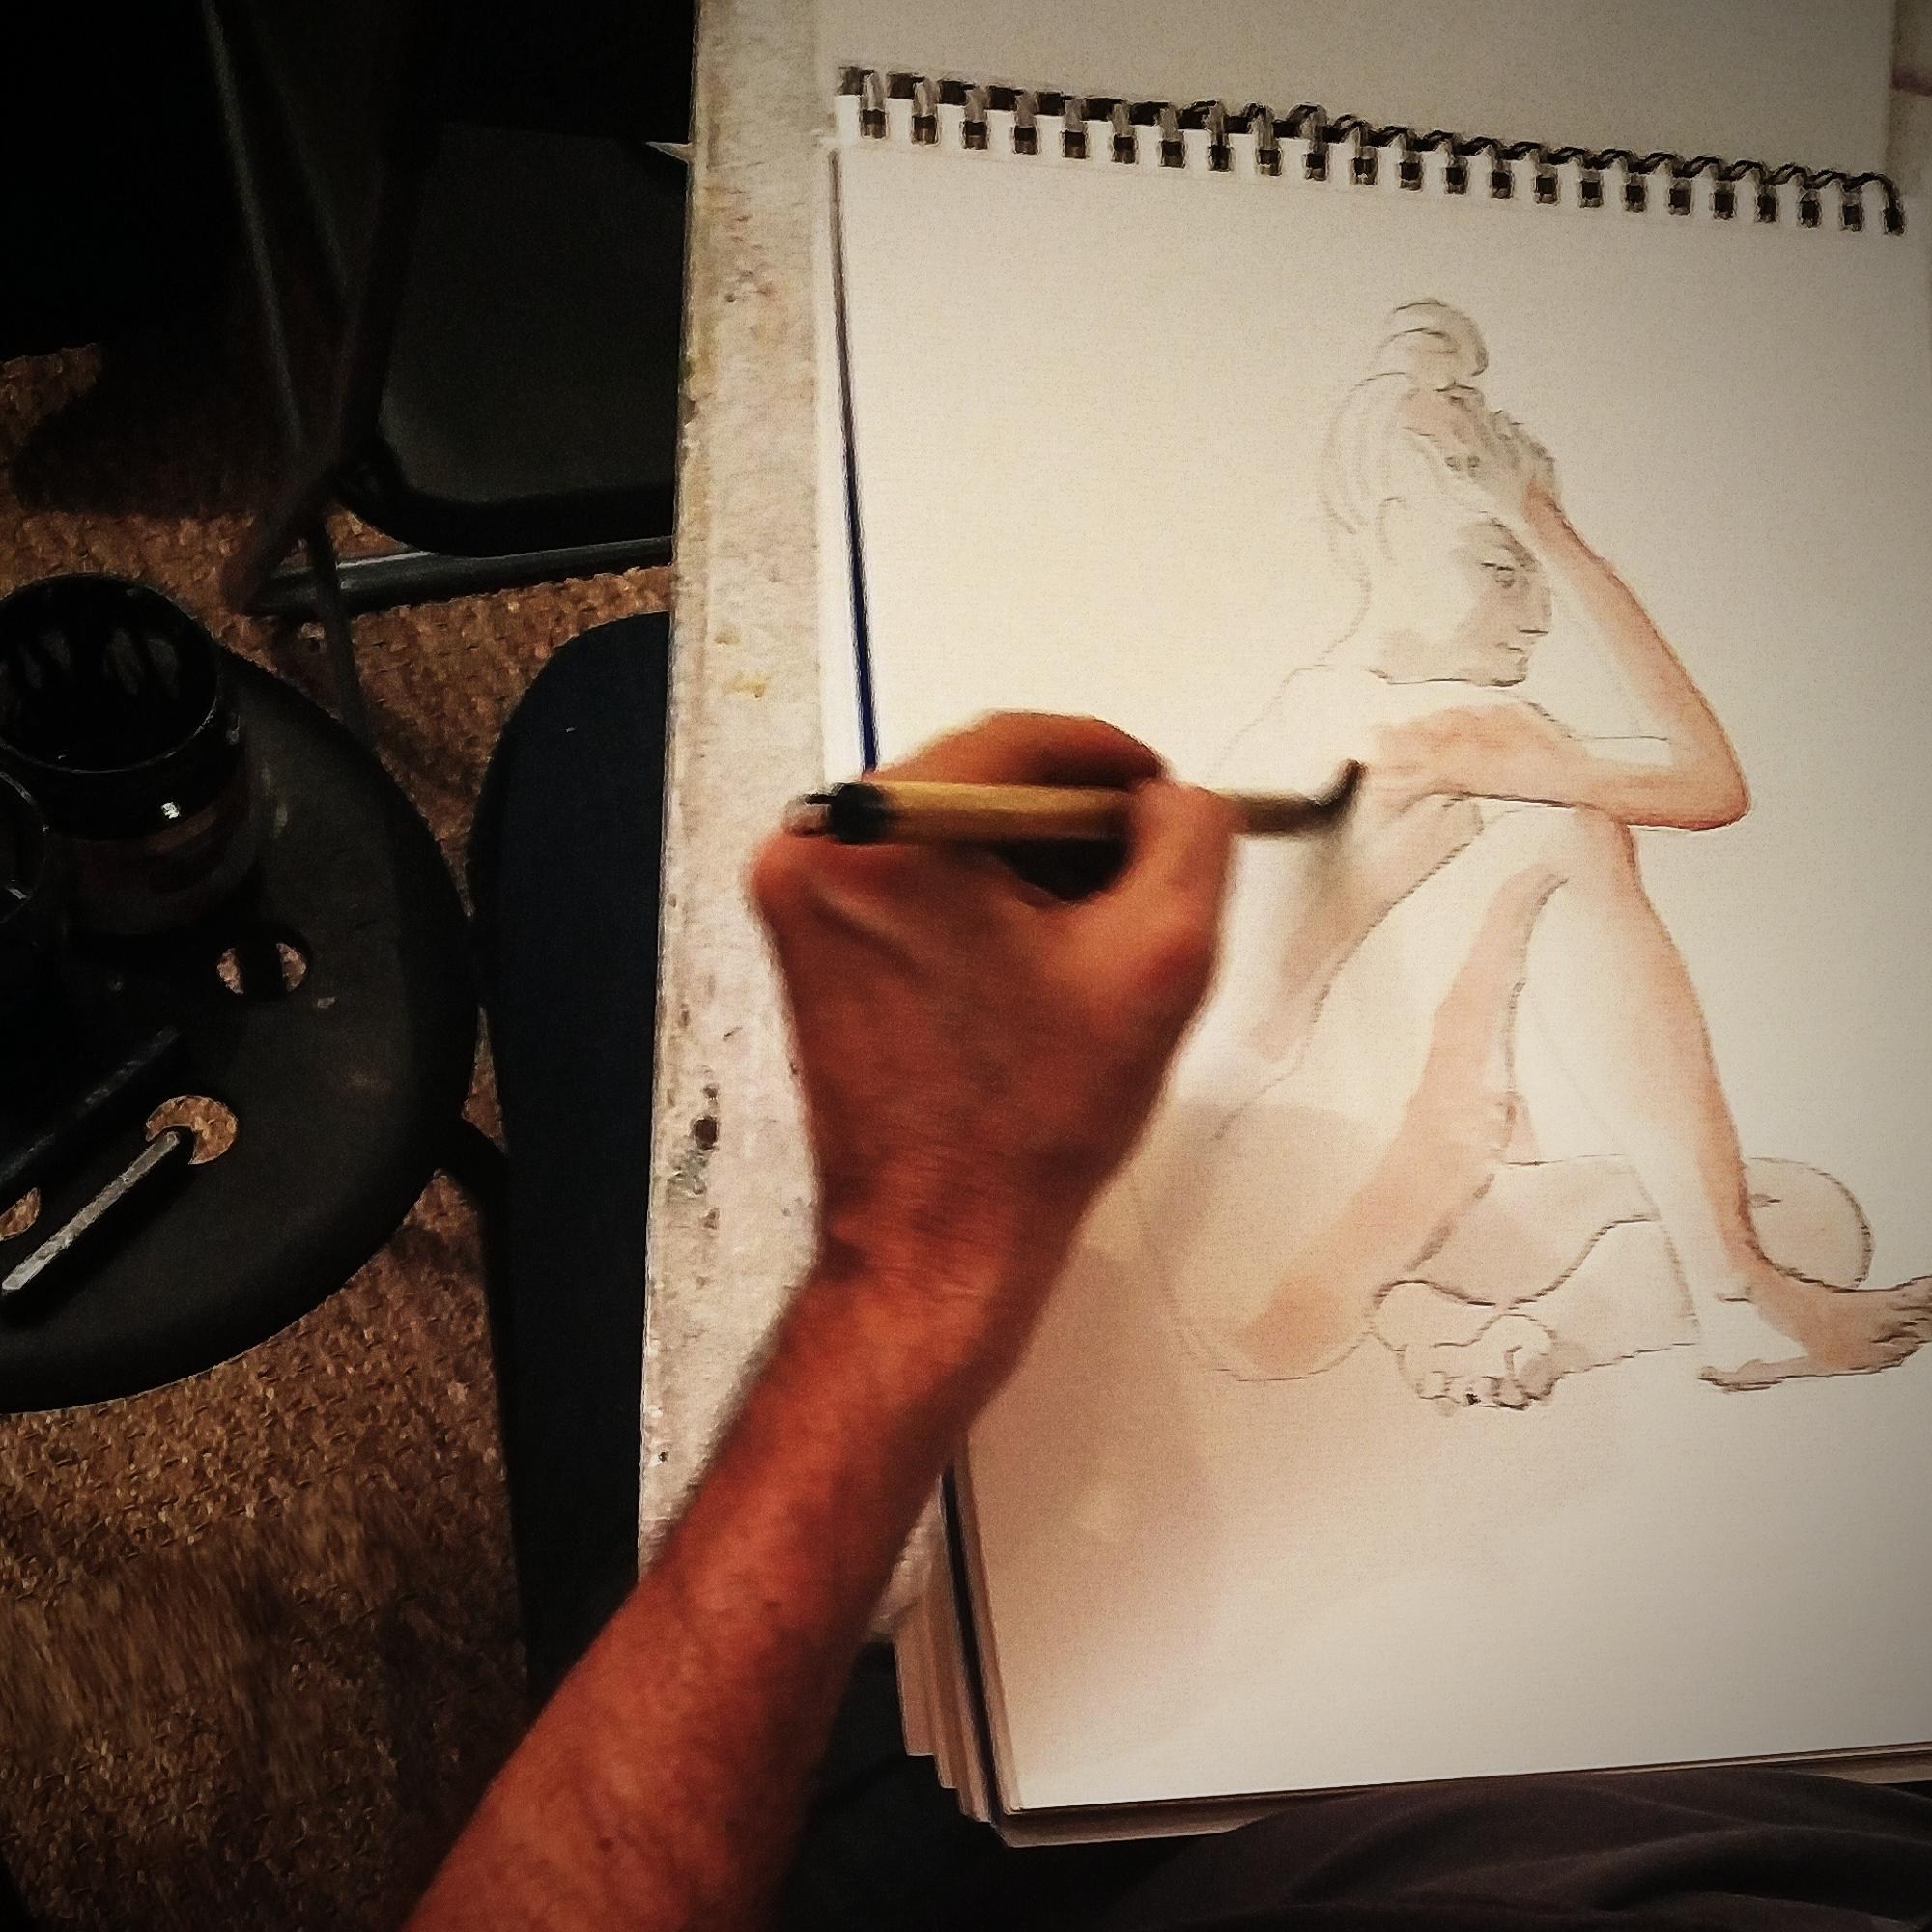 Carnet papier aquarelleCroquis rapide dessin carnet de croquis couleurs  cours de dessin